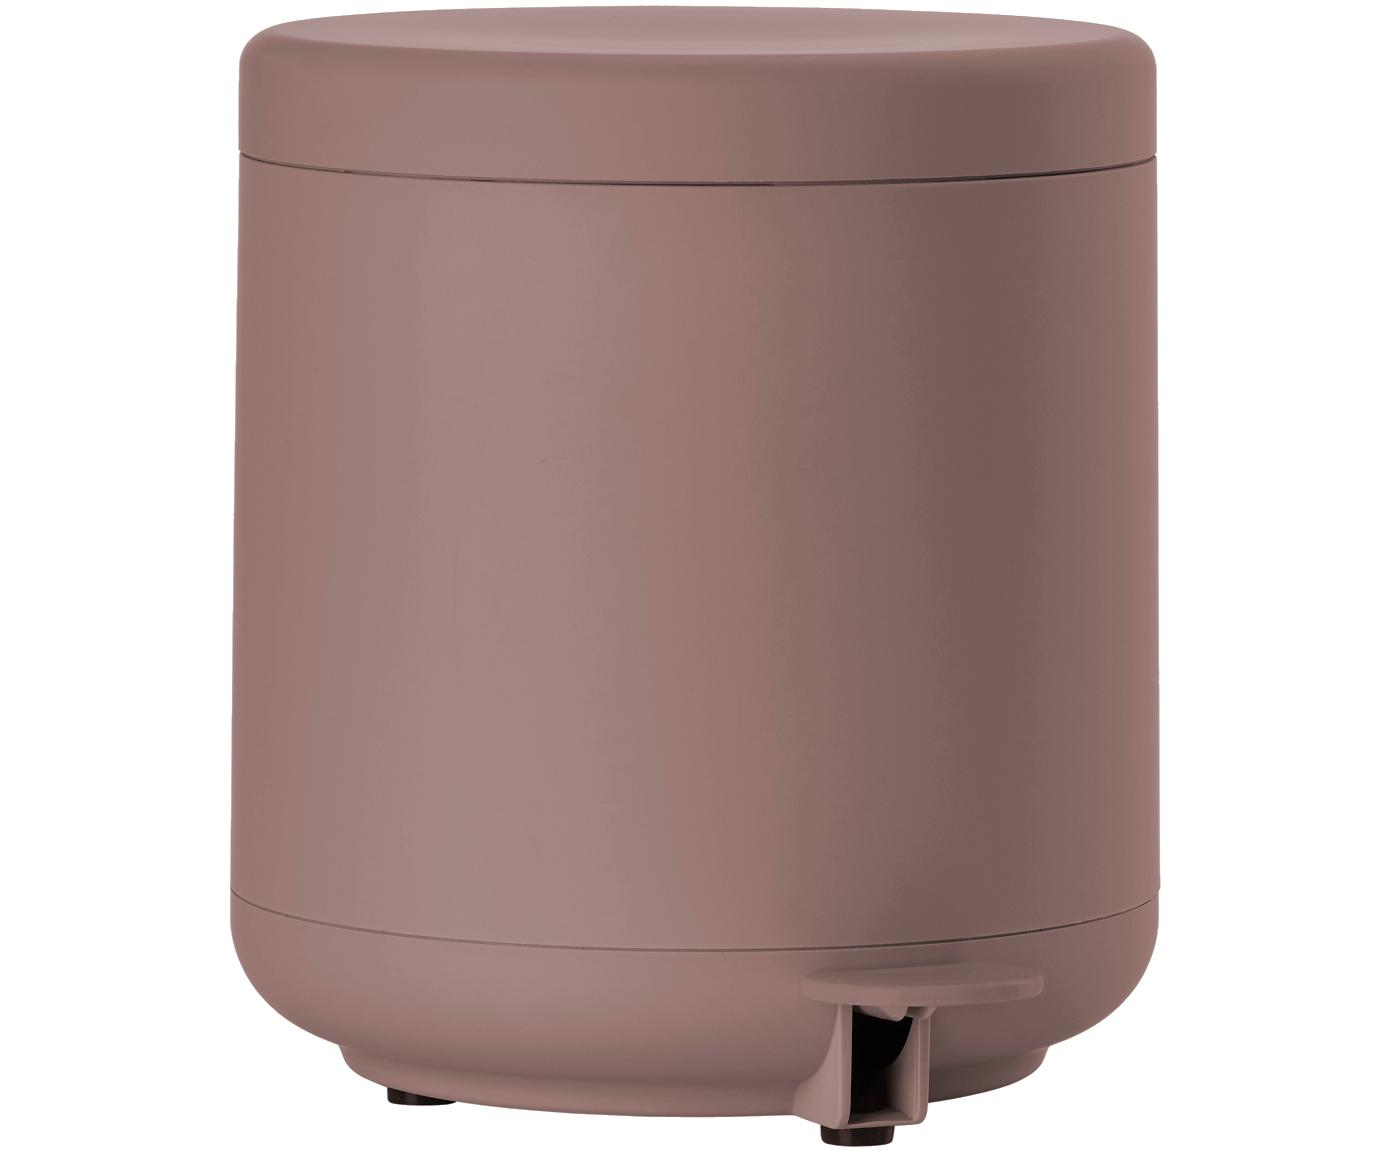 Abfalleimer Ume mit Pedal-Funktion, Kunststoff (ABS), Altrosa, matt, Ø 20 x H 22 cm